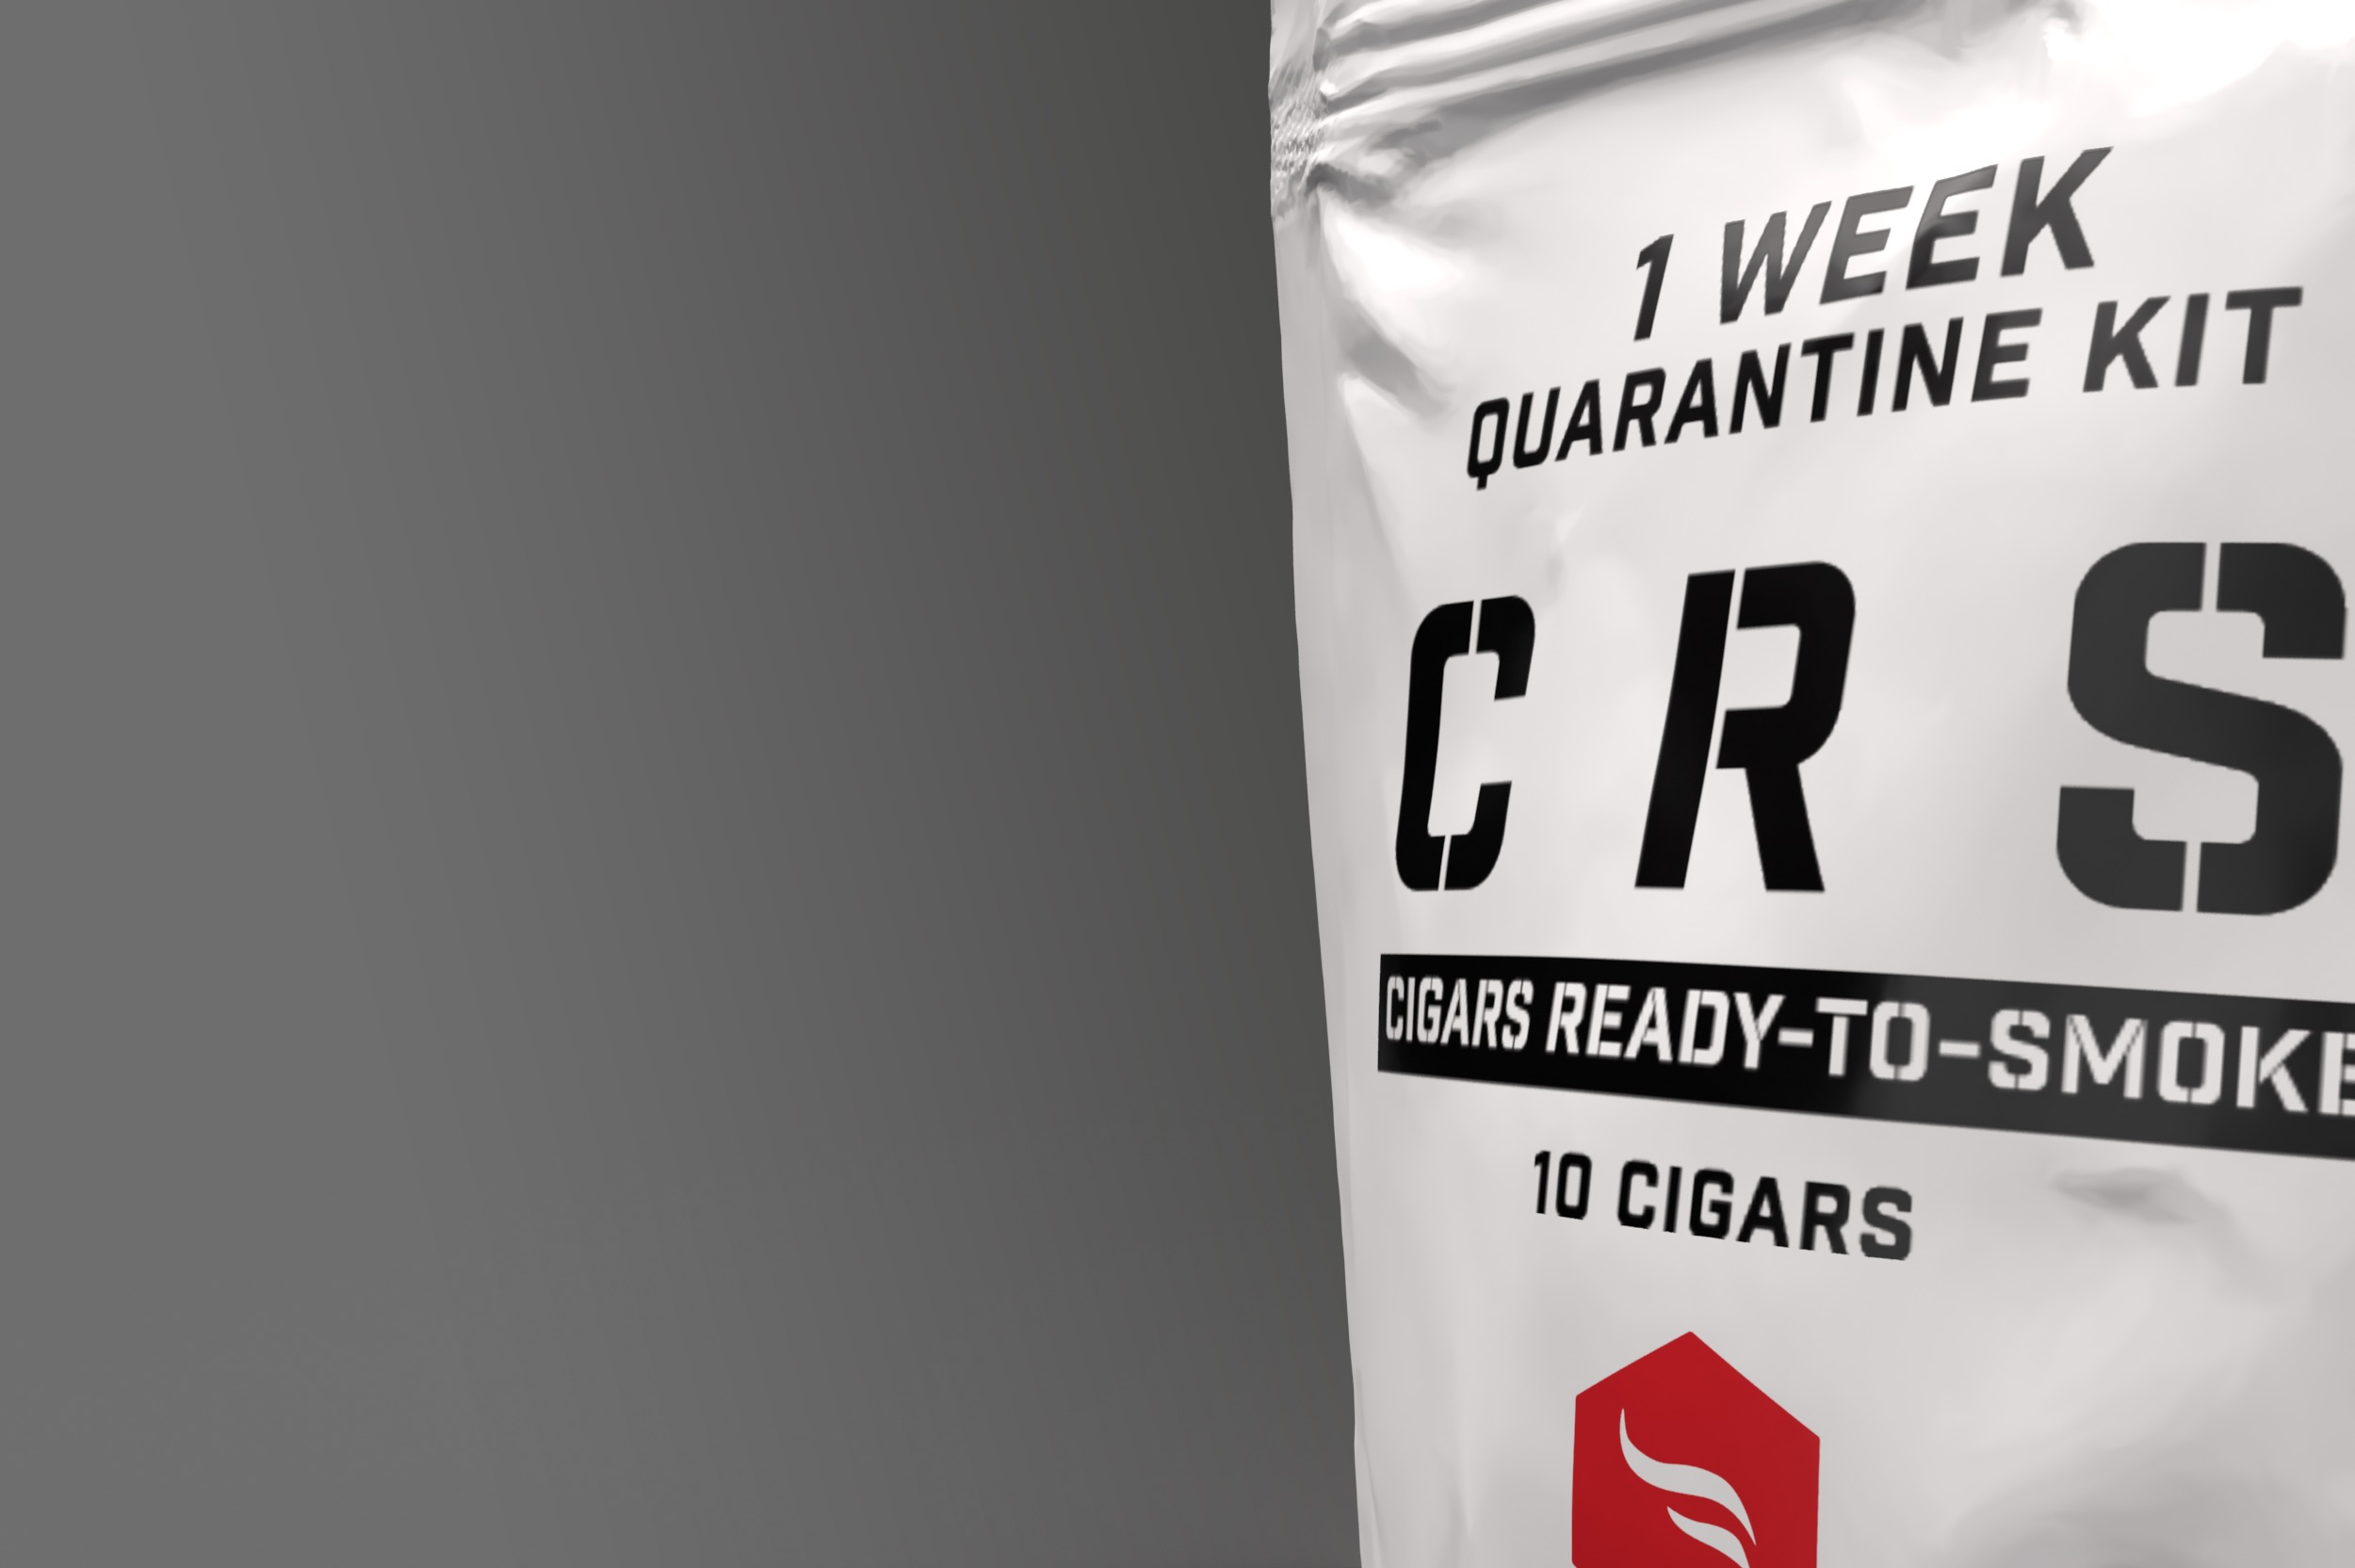 1 week quarantine kit CRS- cigars ready to smoke 10 cigars